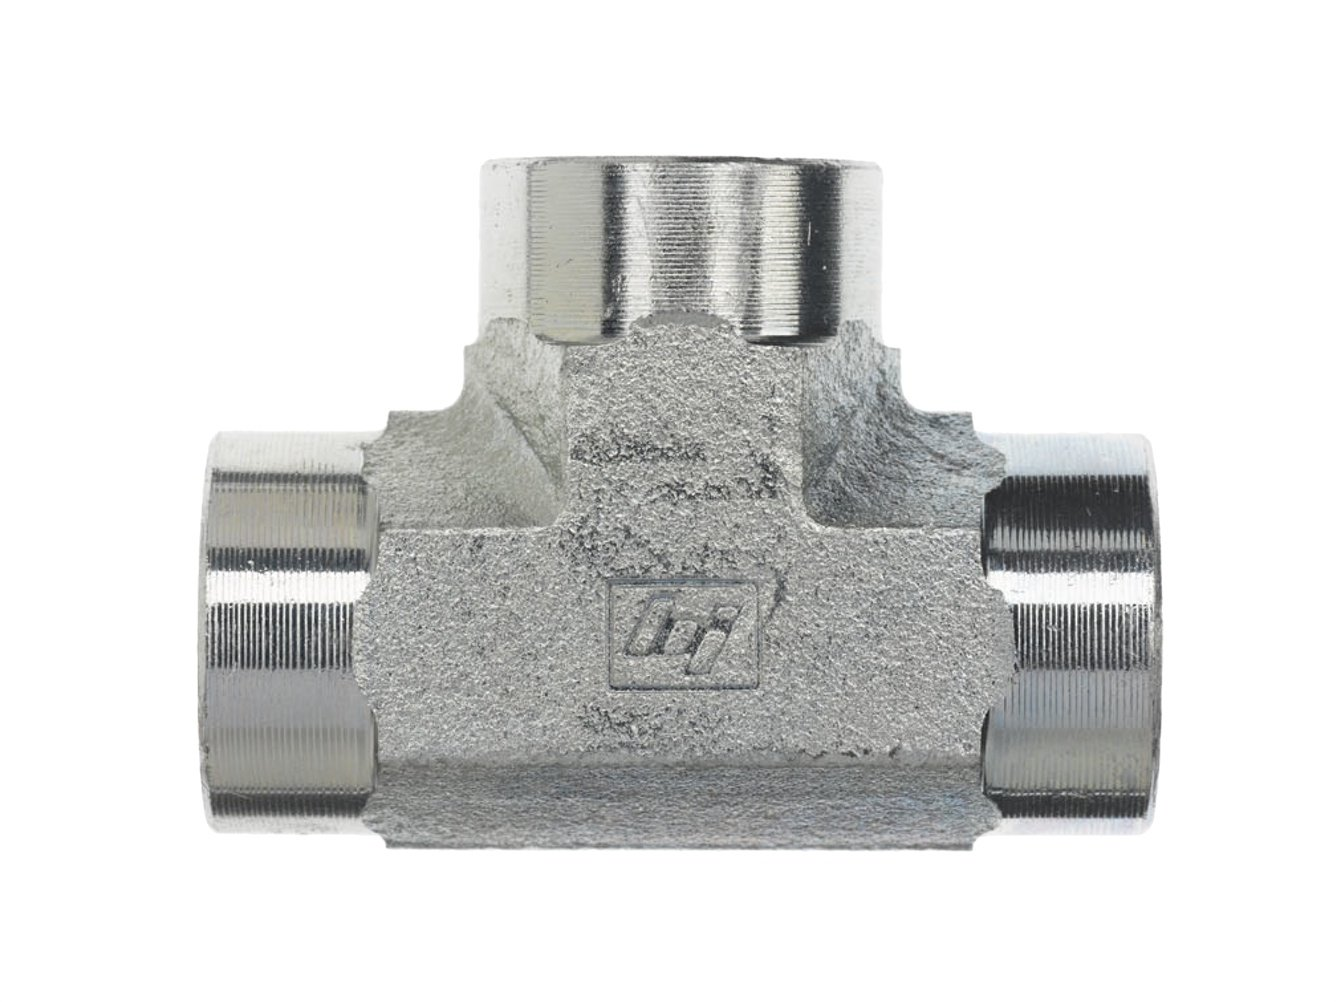 Brennan 5605-04-04-04-SS Stainless Steel Pipe Fitting 1//4 NPT Female Tee